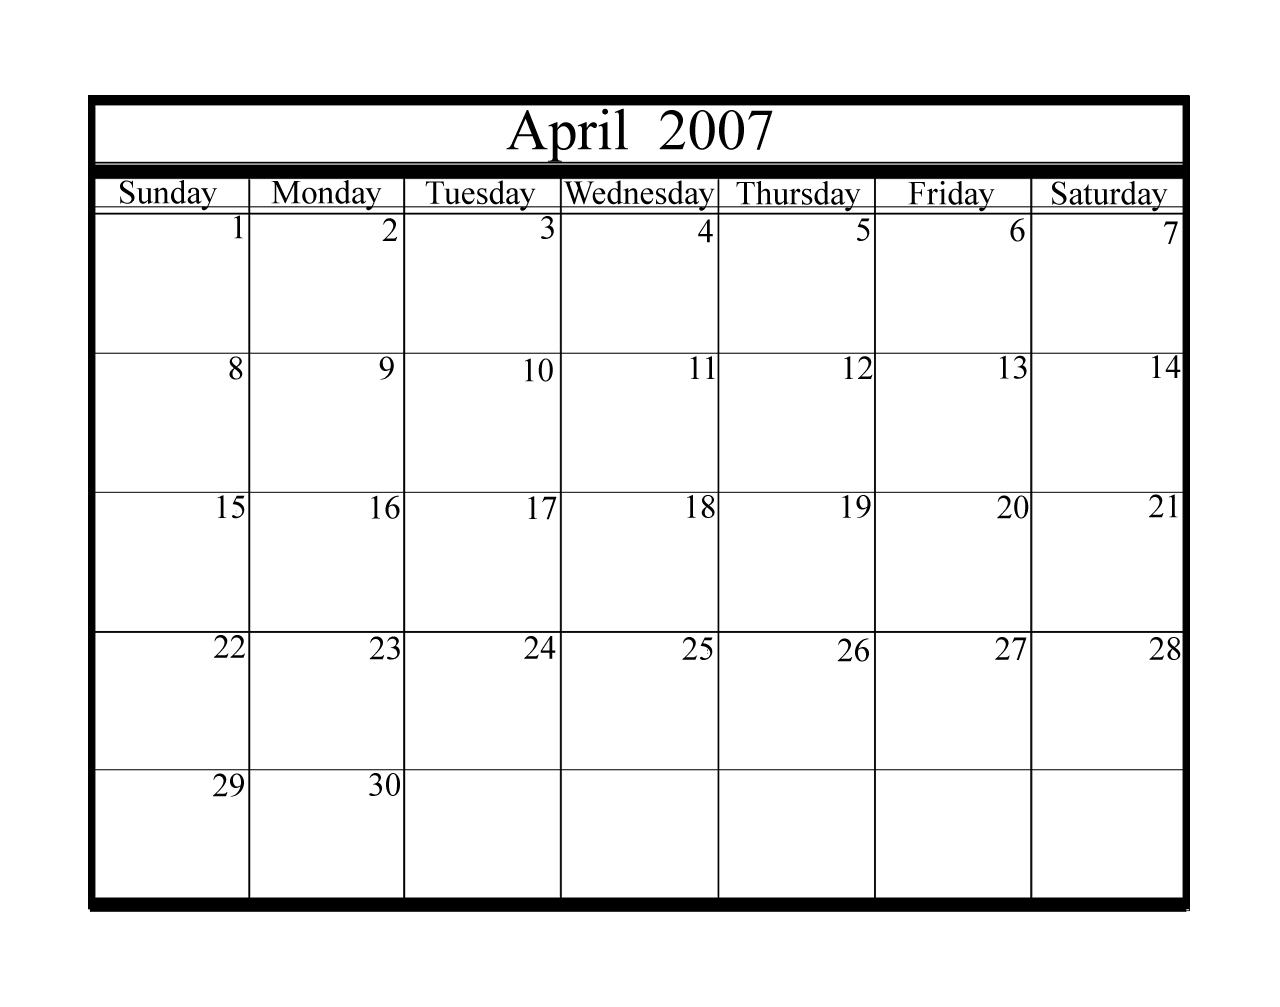 Evenementen Kalender – iJems (c) Judo Bond Nederland 2007